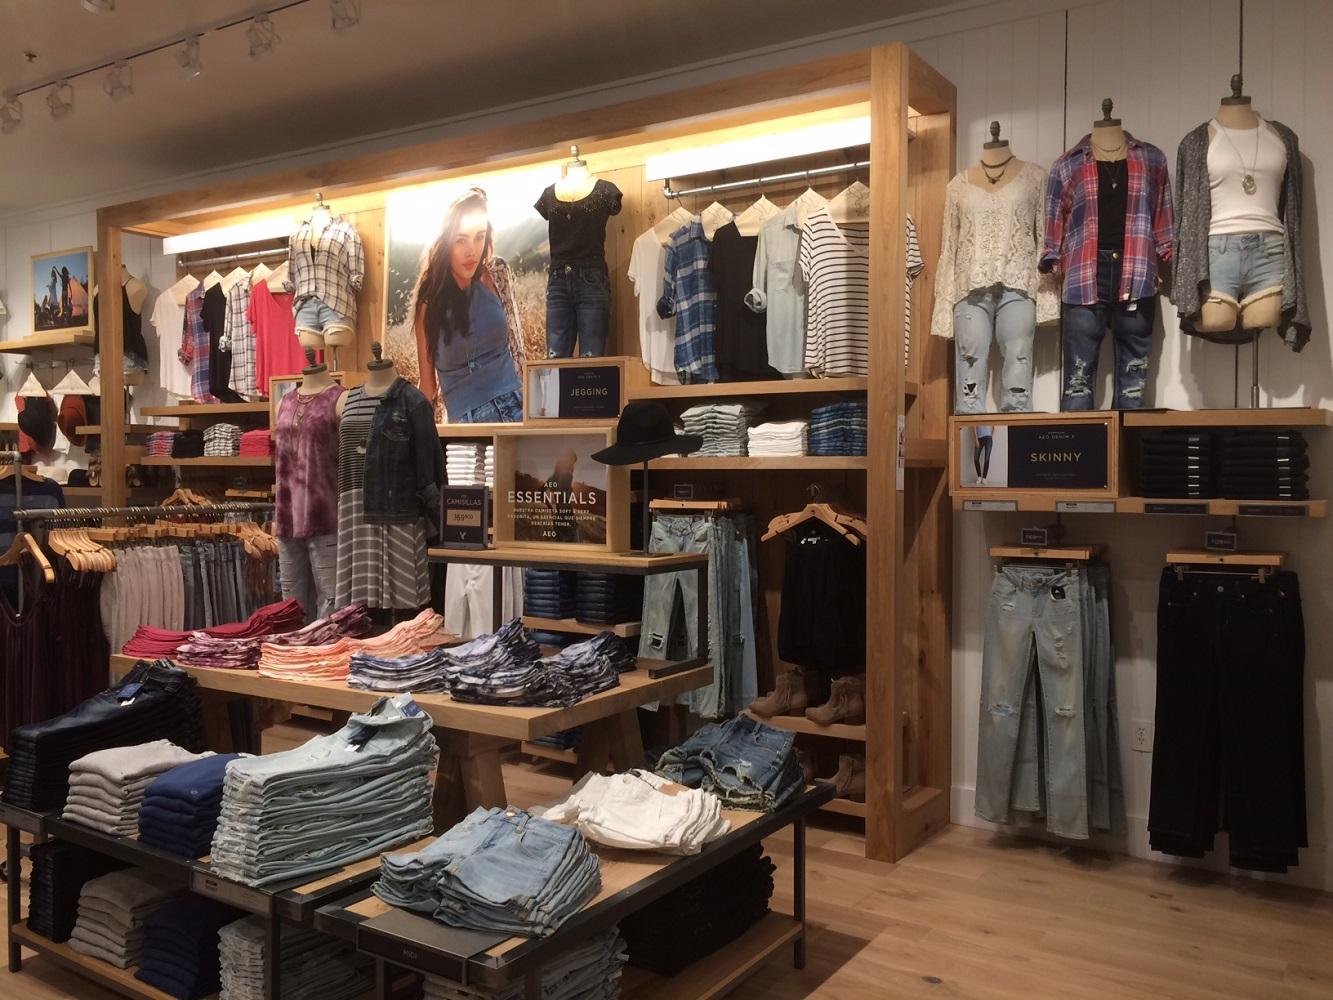 Interior - Clothes Shelves.jpg